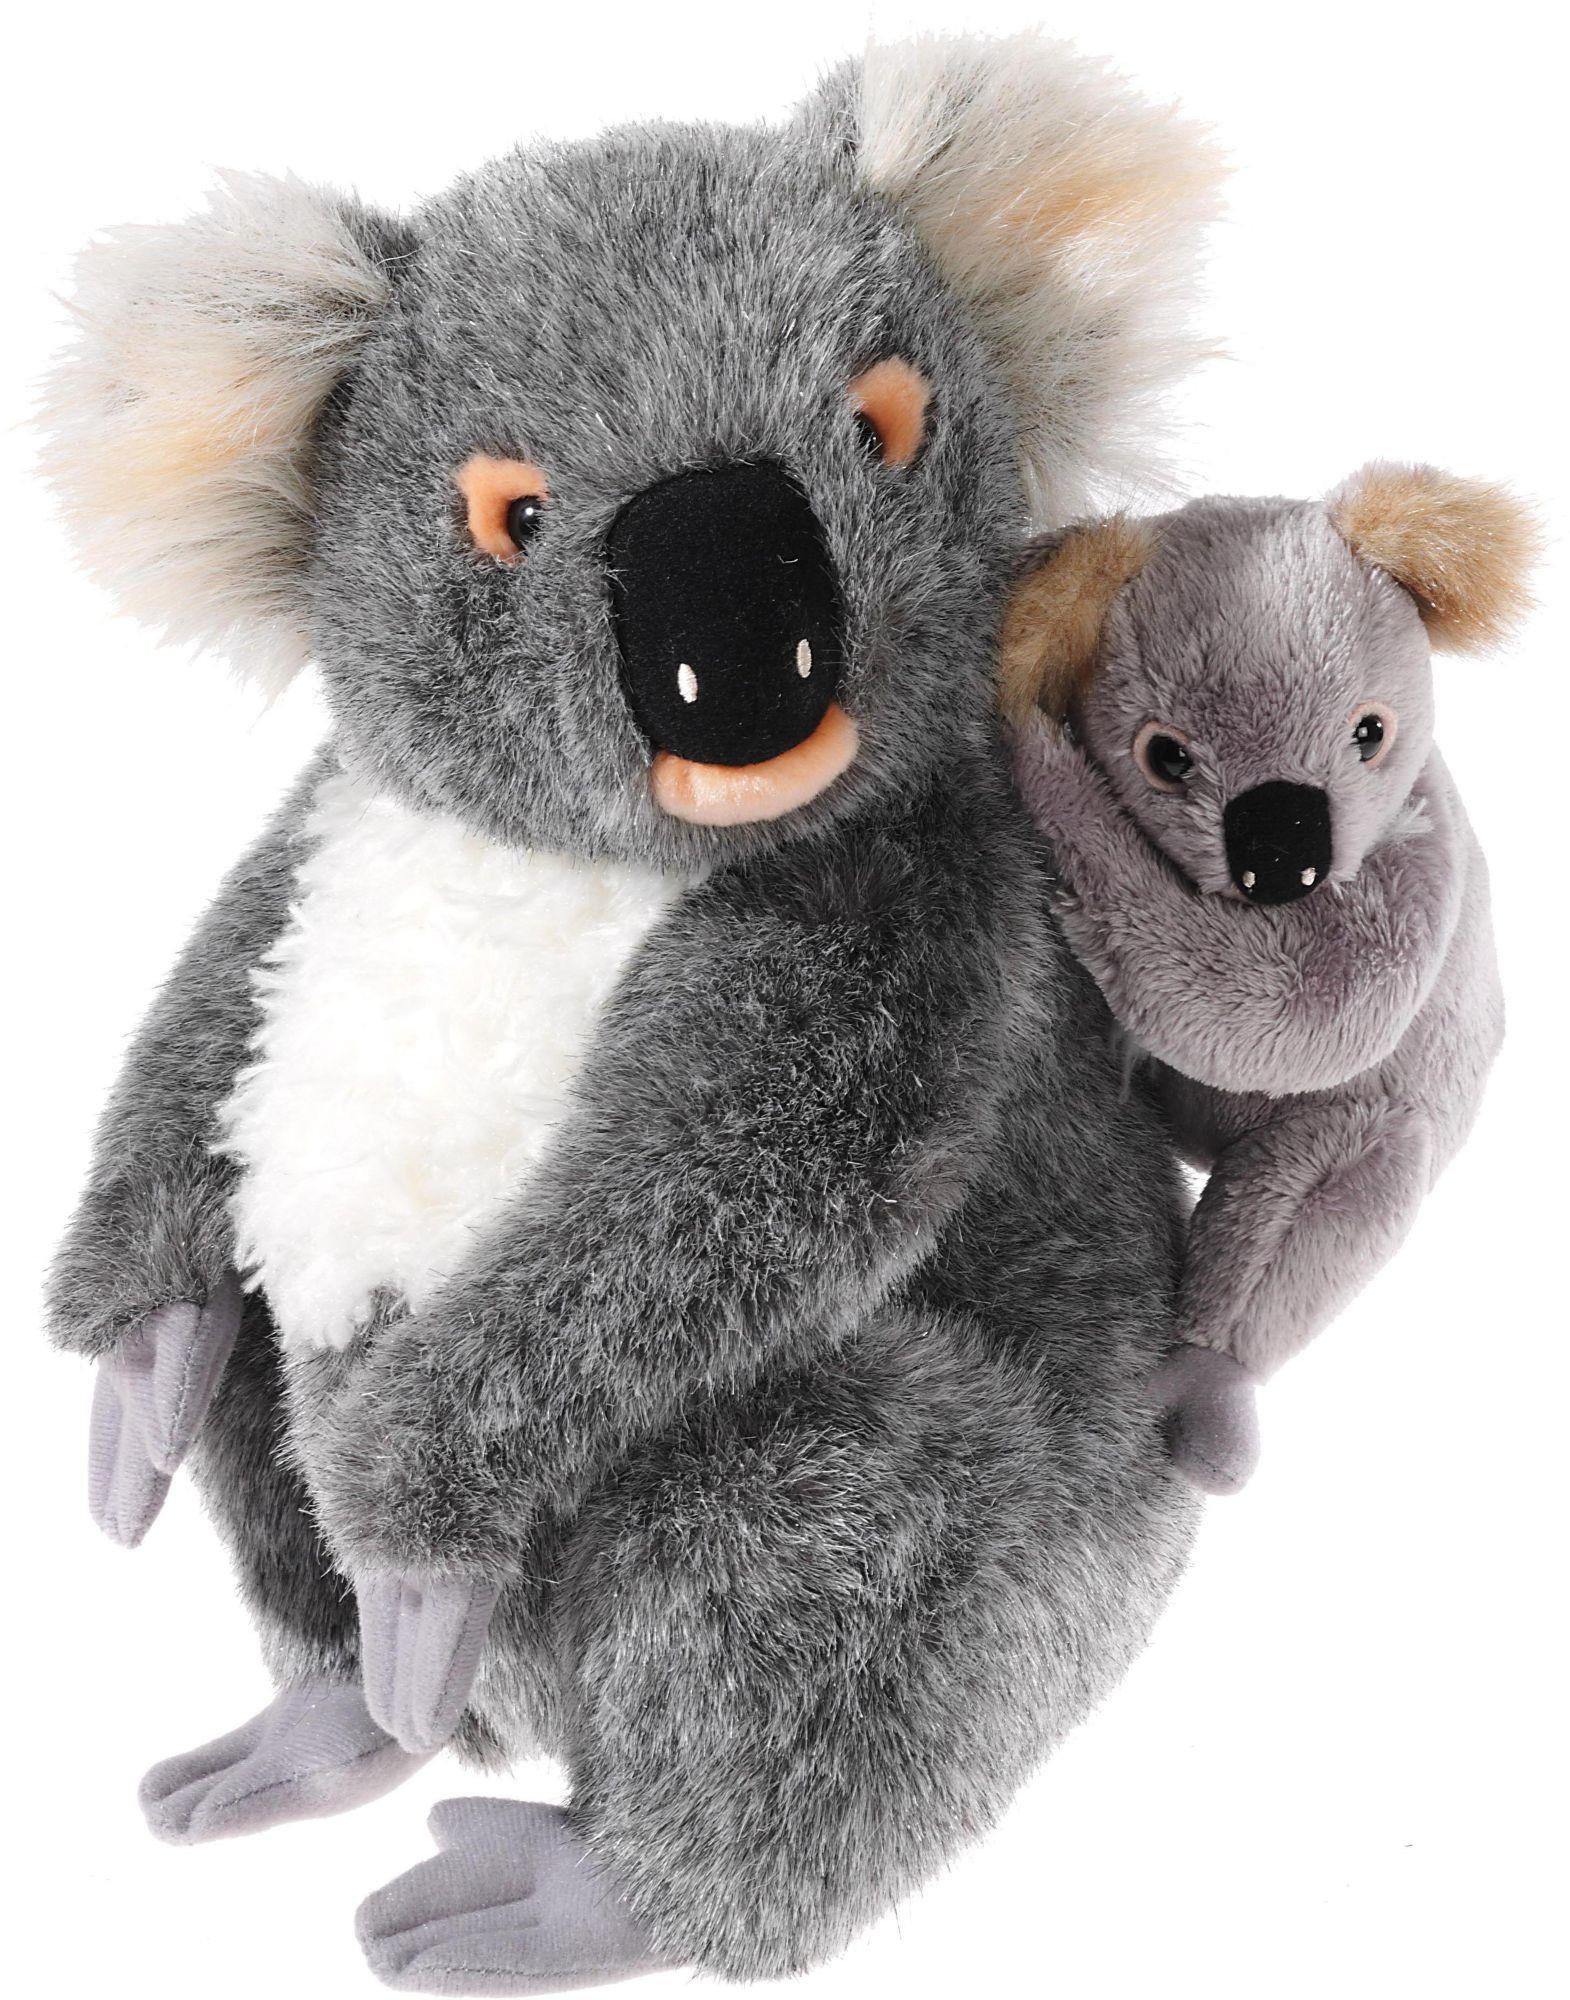 HEUNEC Heunec Kuscheltier, »Mi Classico, Koala Bär mit Baby«